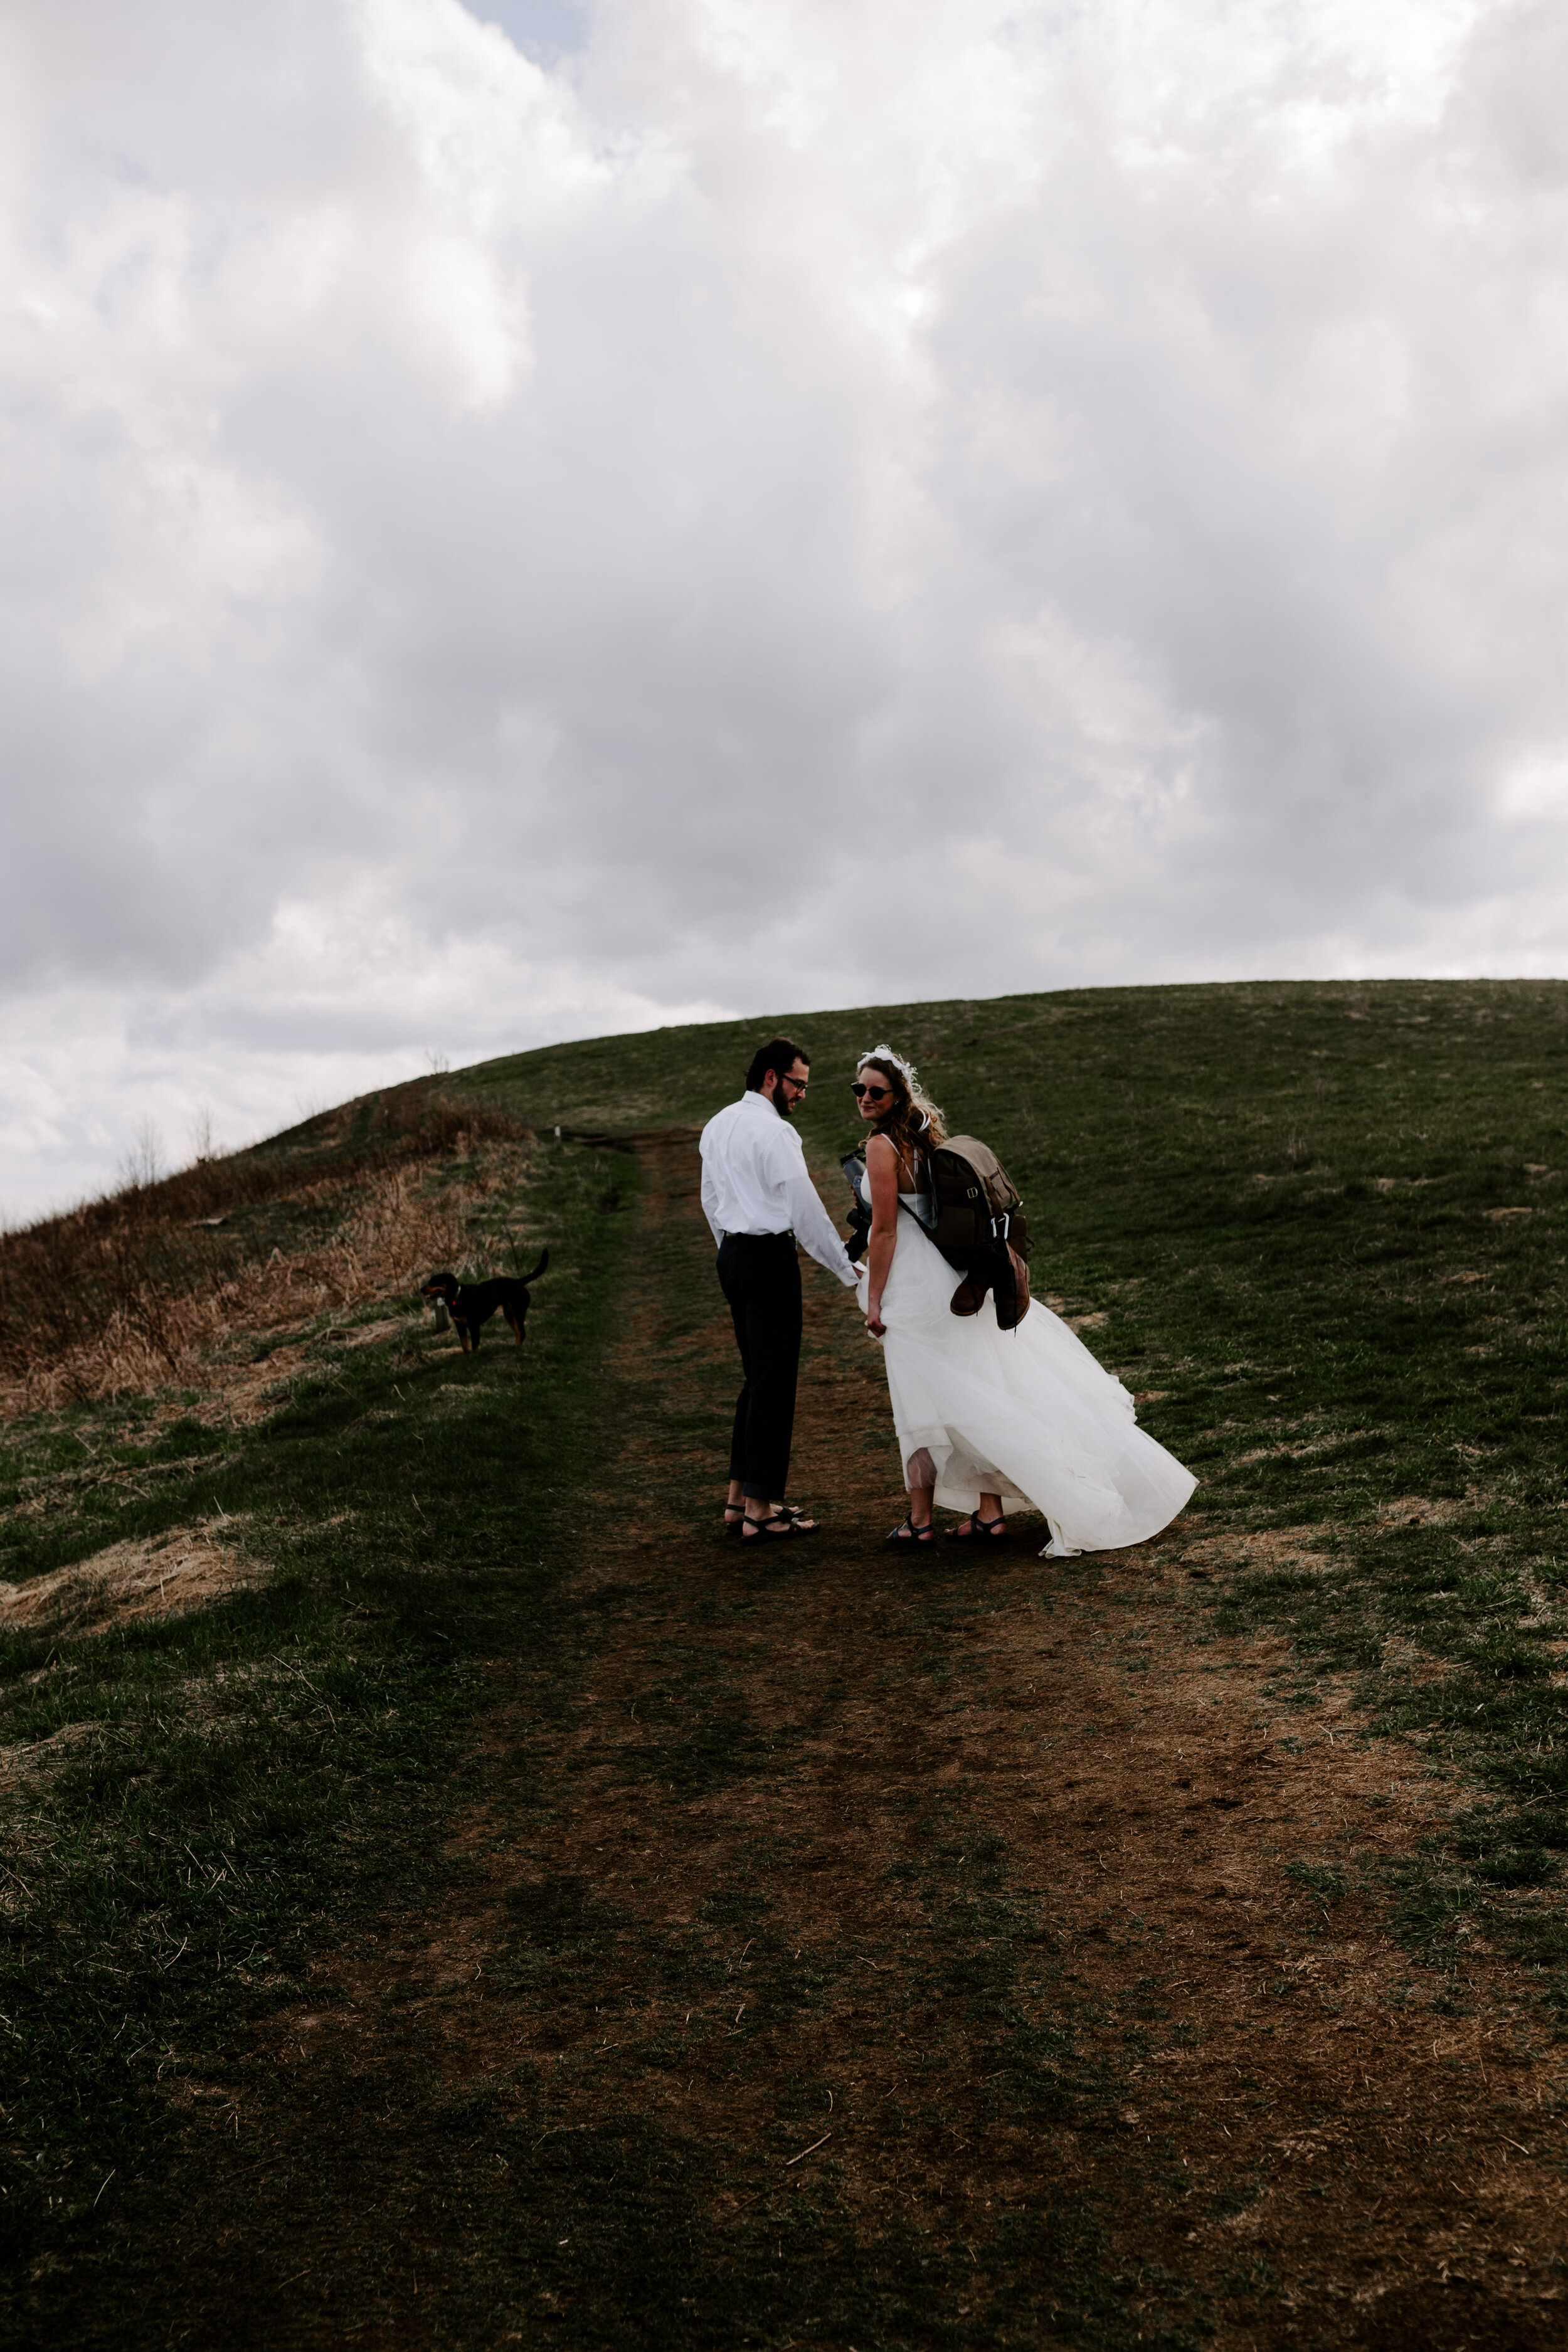 Oahu hawaii intimate wedding elopement photographer